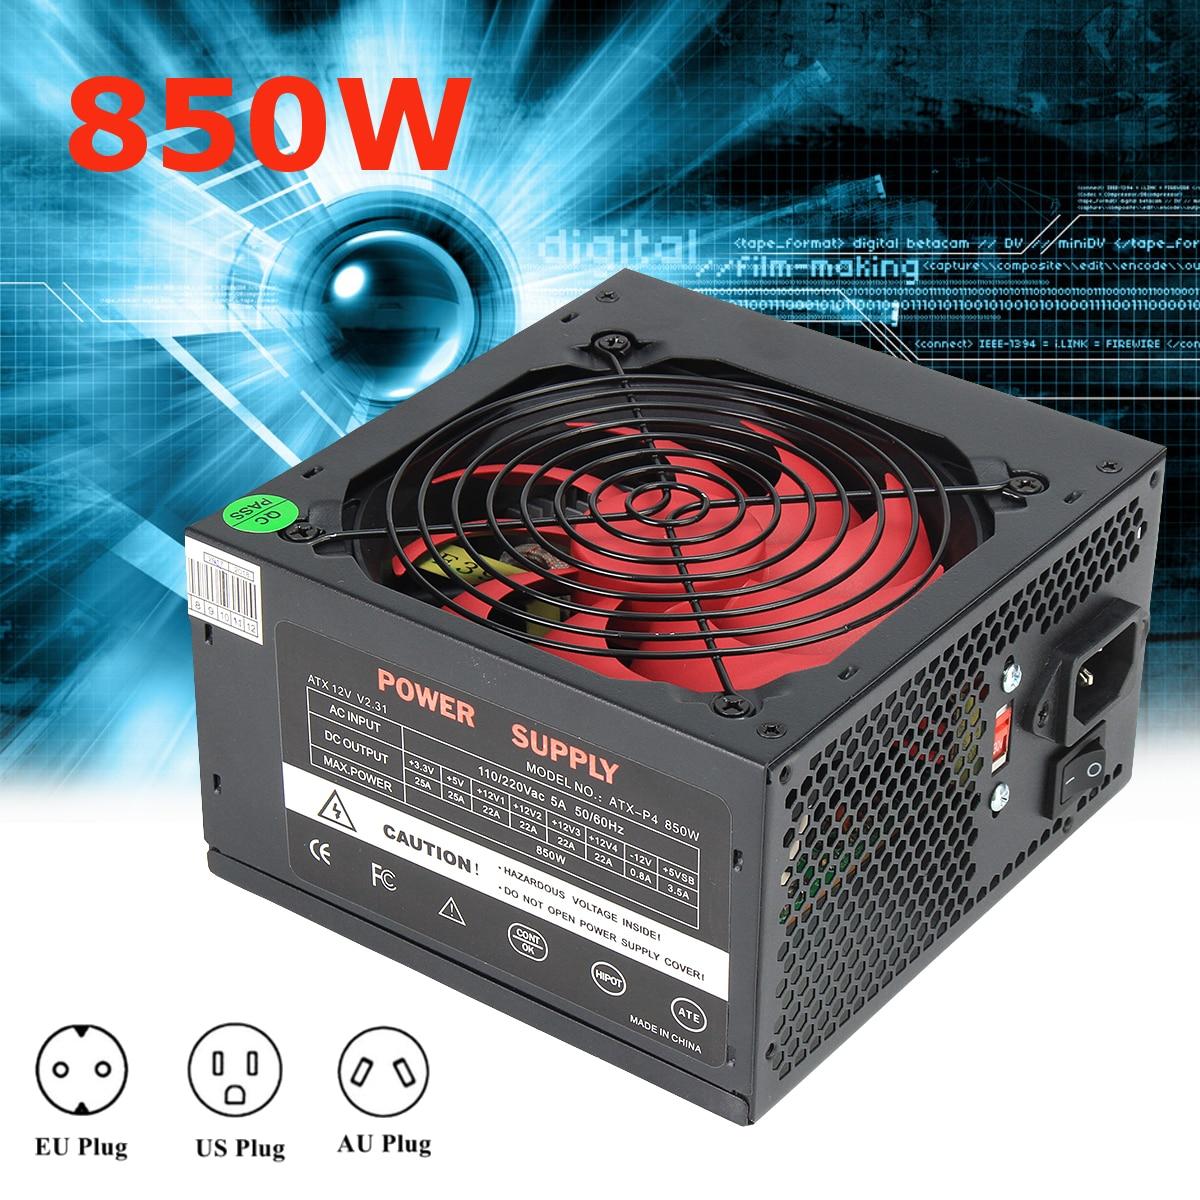 цена на ATX-PC US/AU/EU Plug 850W 850 Watt BTC Power Supply 120mm Fan 24 Pin PCI SATA ATX 12V Molex Connect Miner Computer Power Supply